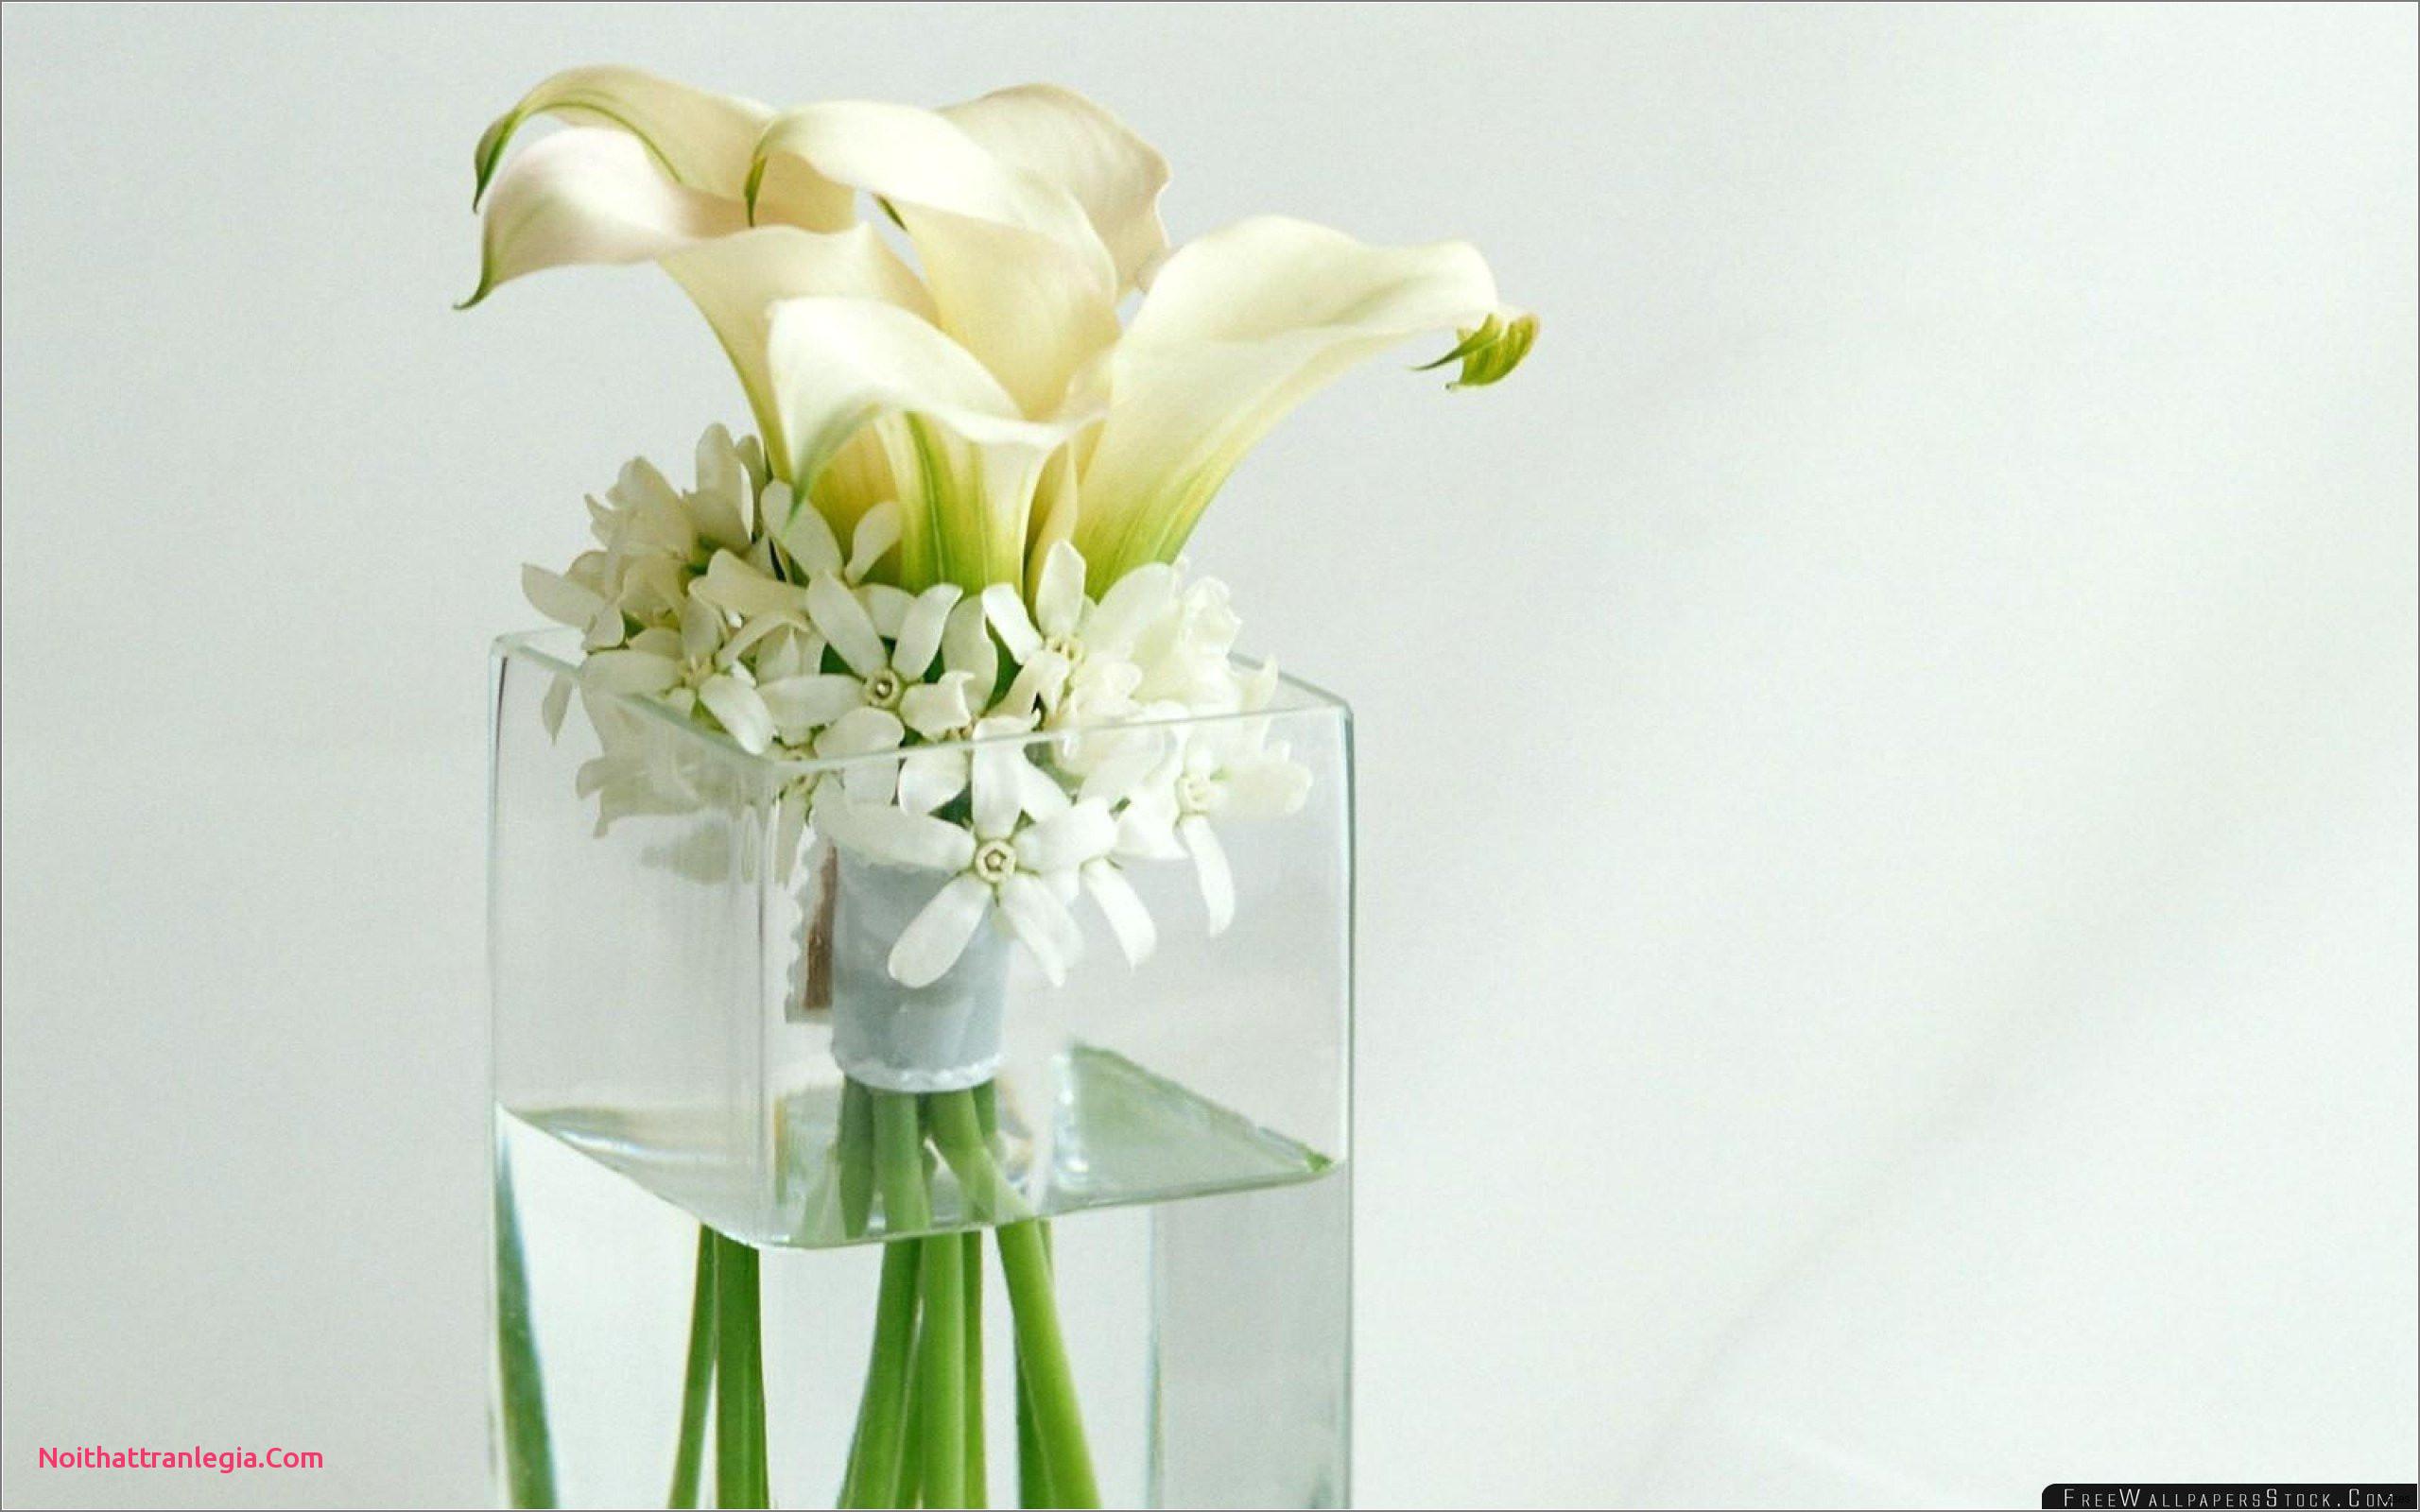 gold tall vases wholesale of 20 wedding vases noithattranlegia vases design for wedding petals amazing tall vase centerpiece ideas vases flowers in water 0d artificial 2560 87